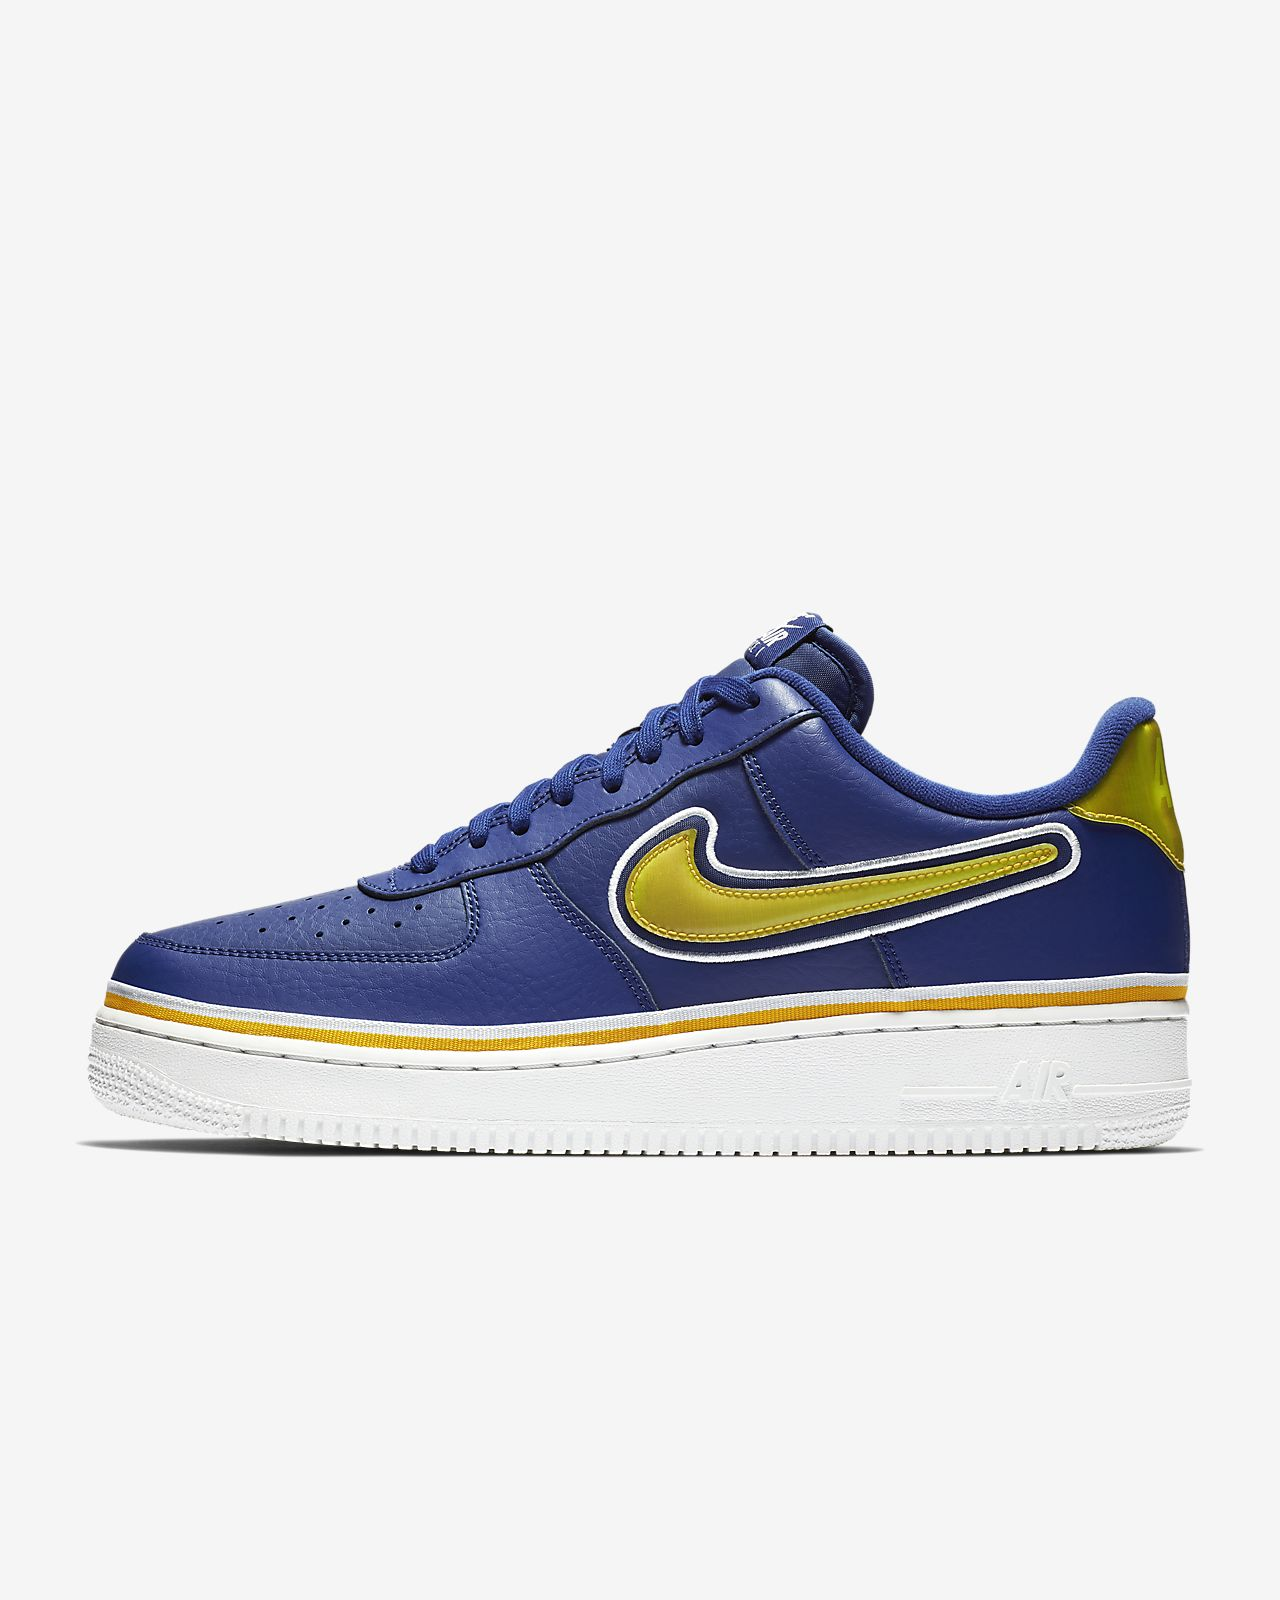 Nike Air Force 1 '07 LV8 Sport NBA Shoe